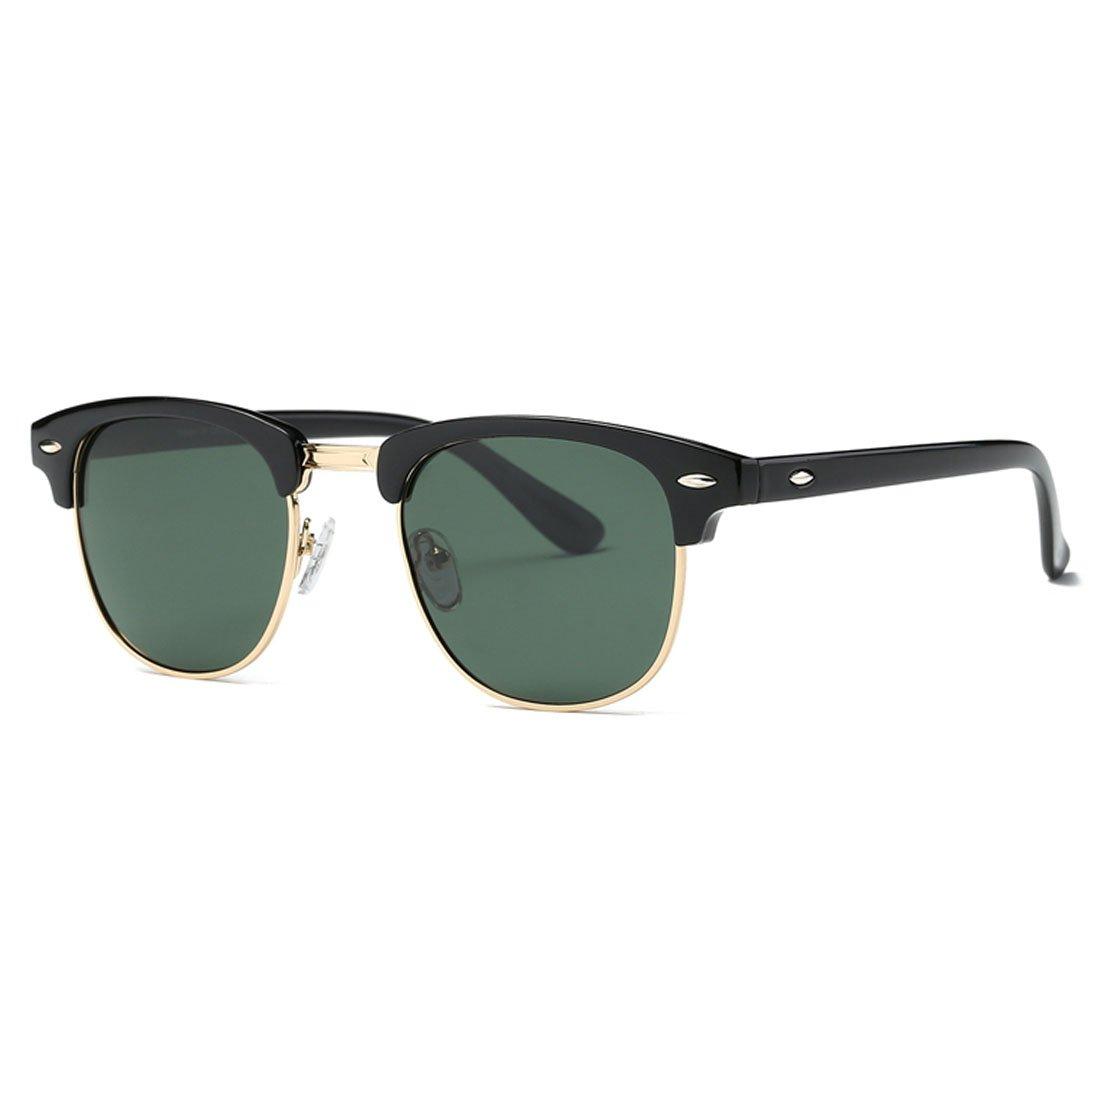 Kimorn Polarized Sunglasses Unisex Retor Semi-Rimless Frame Sun Glasses K0550 K0550~1